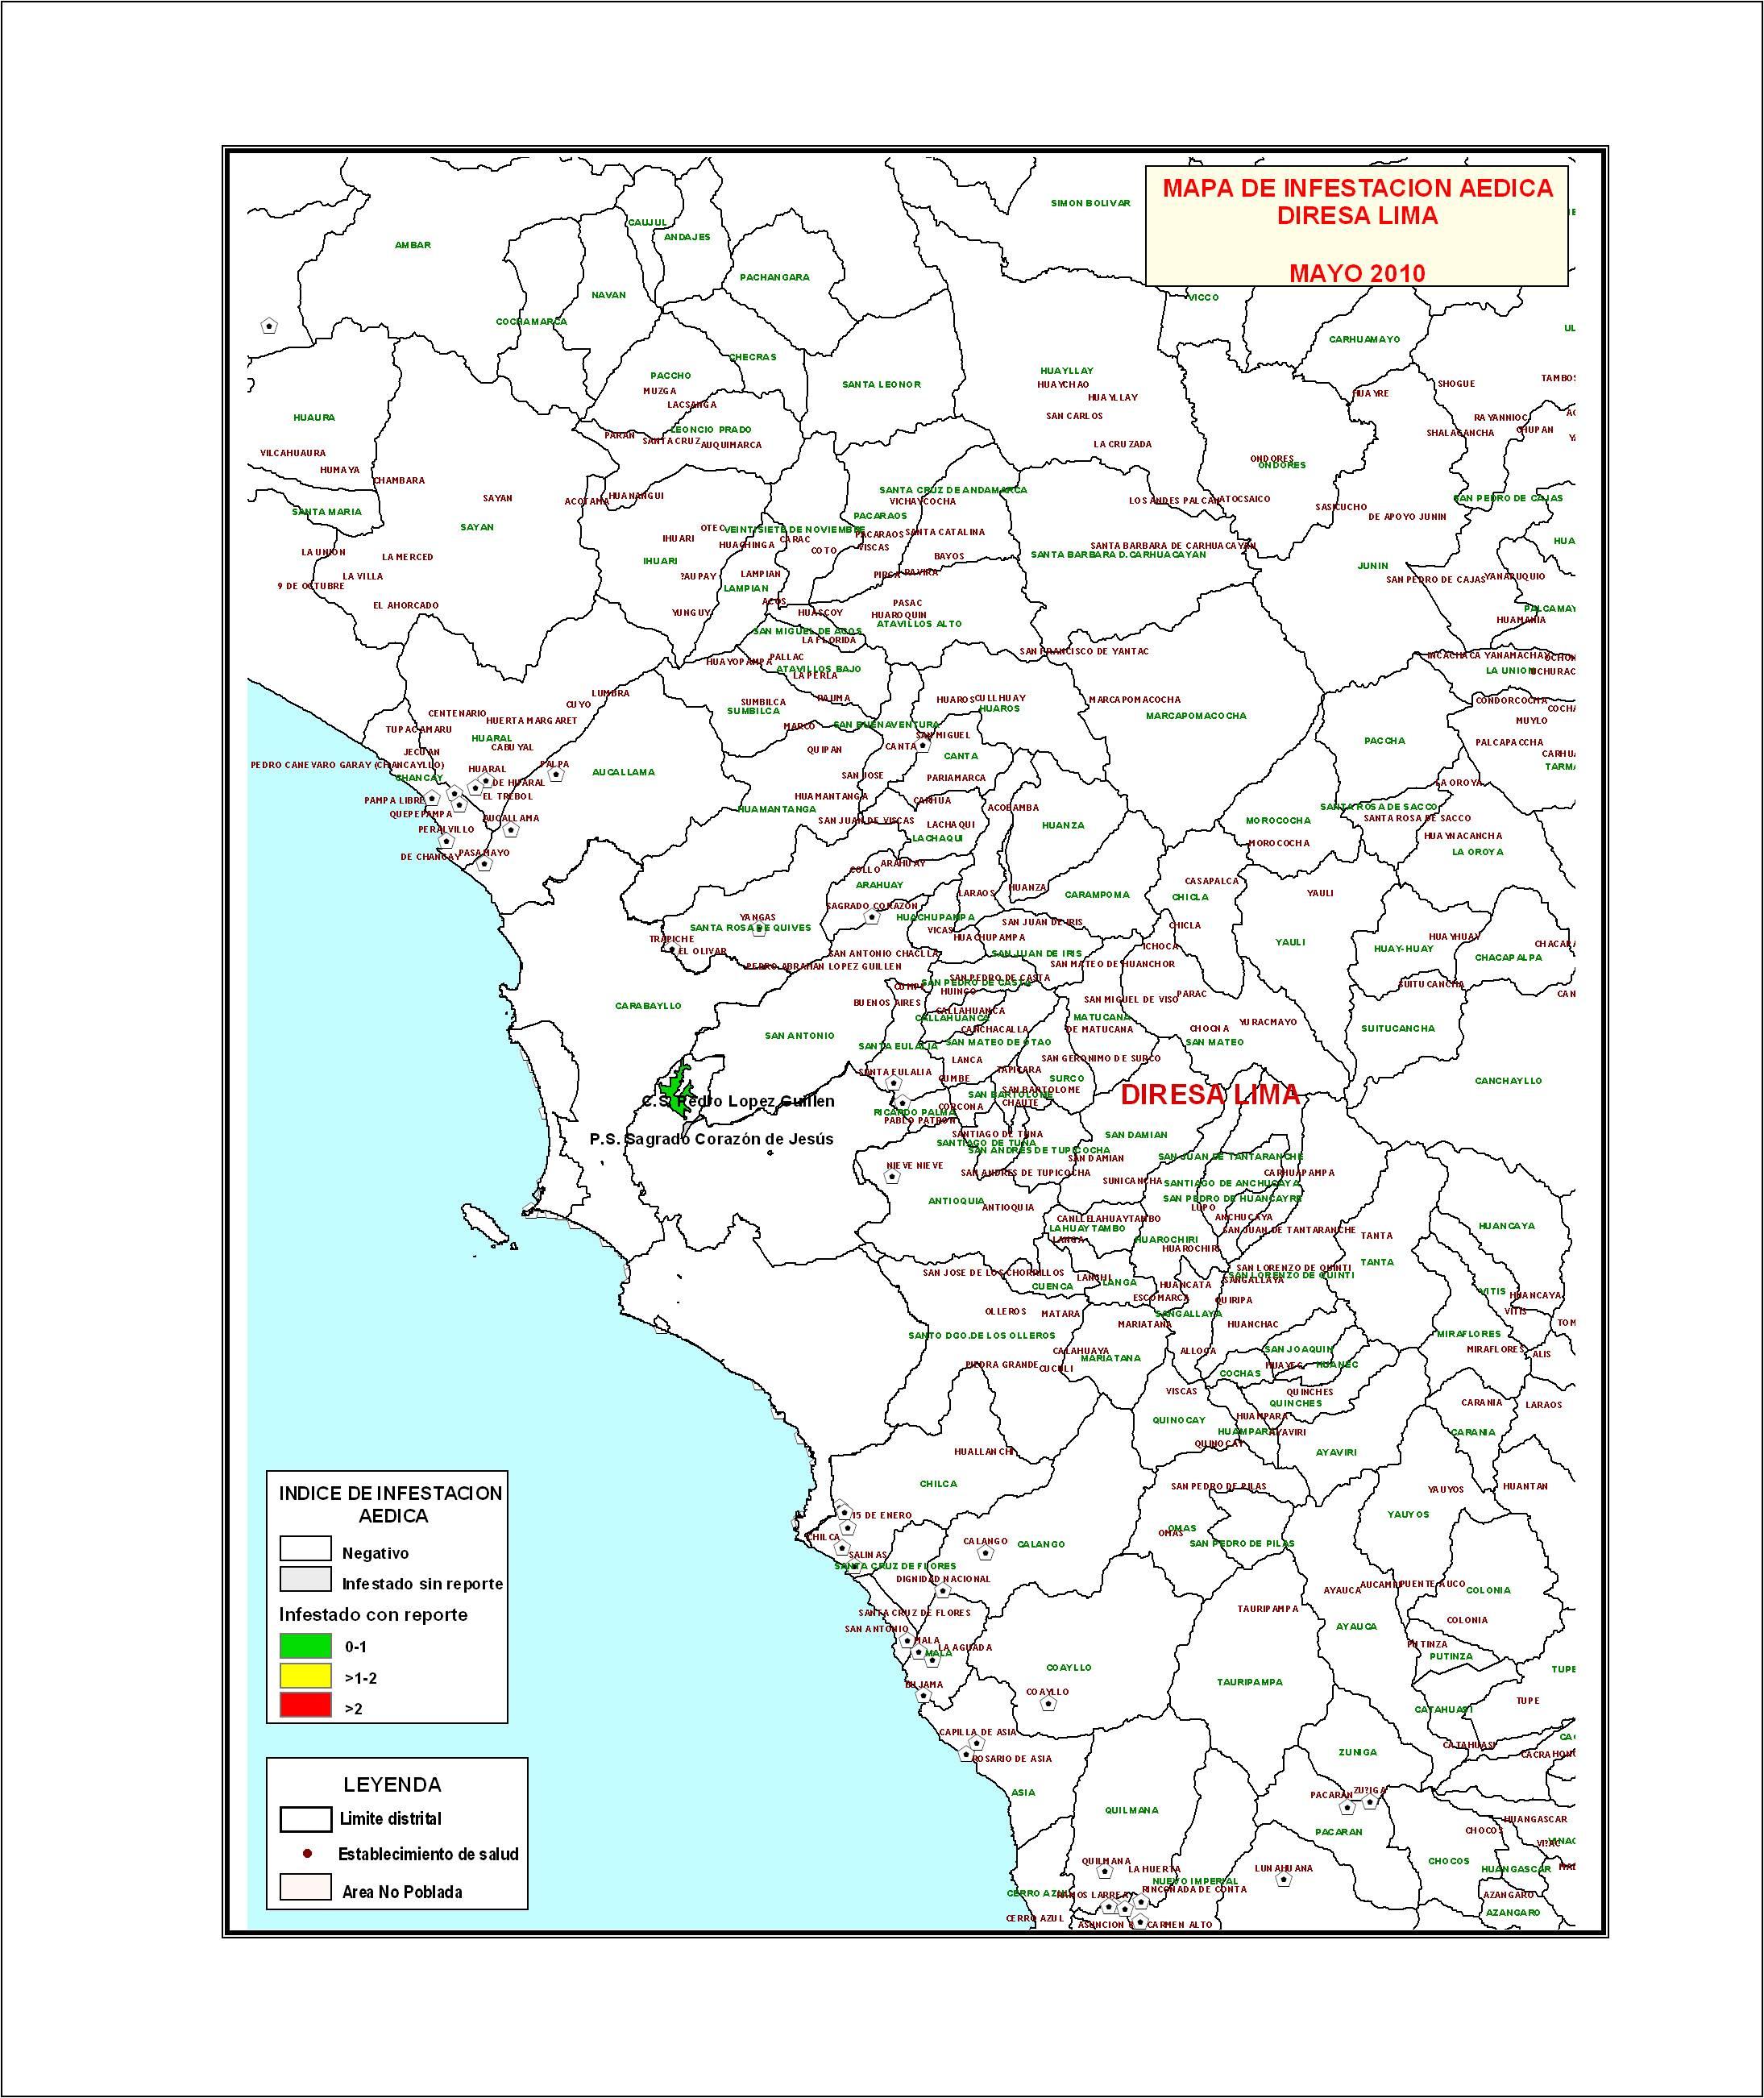 Mapas de Infestacin Adica A Nivel Nacional  DIGESA